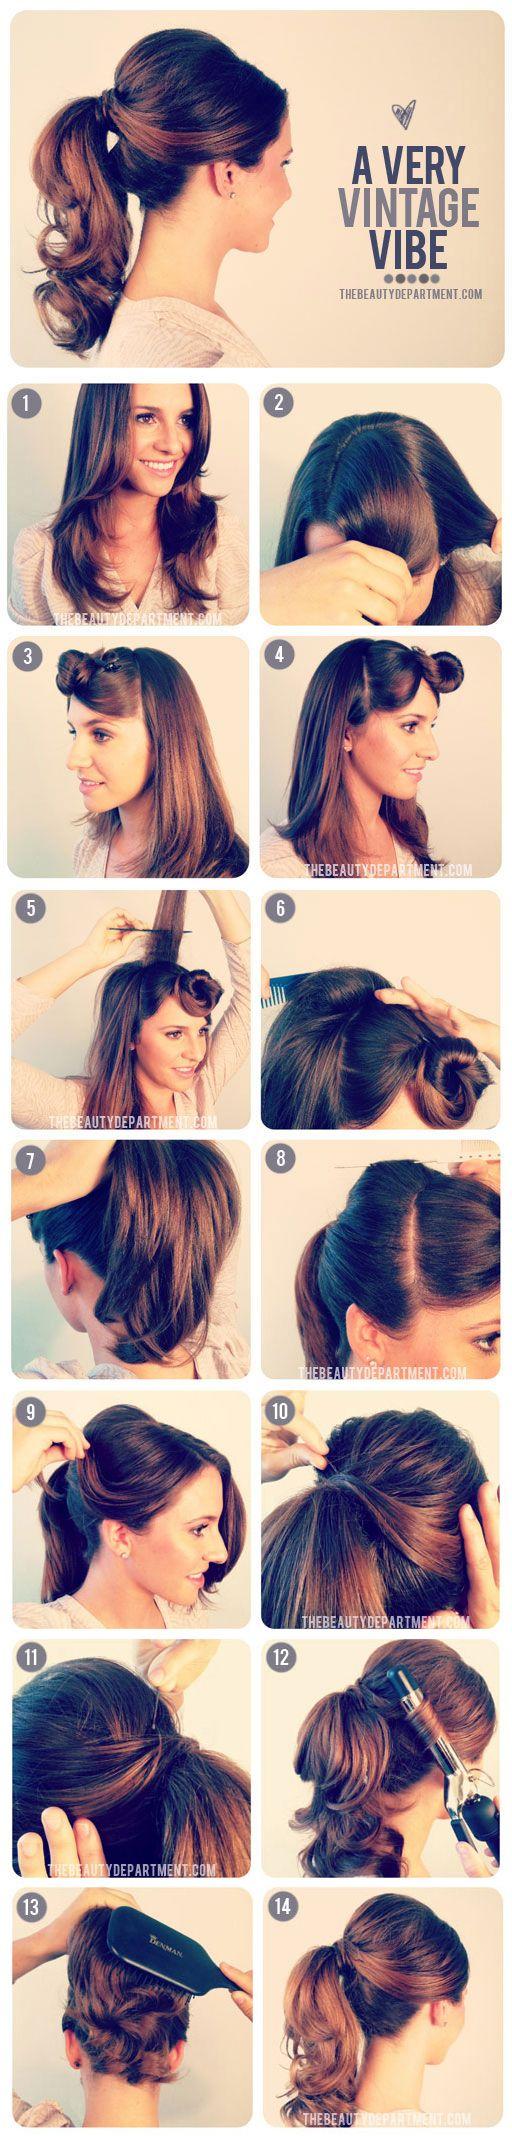 best images about saç şekilleri on Pinterest